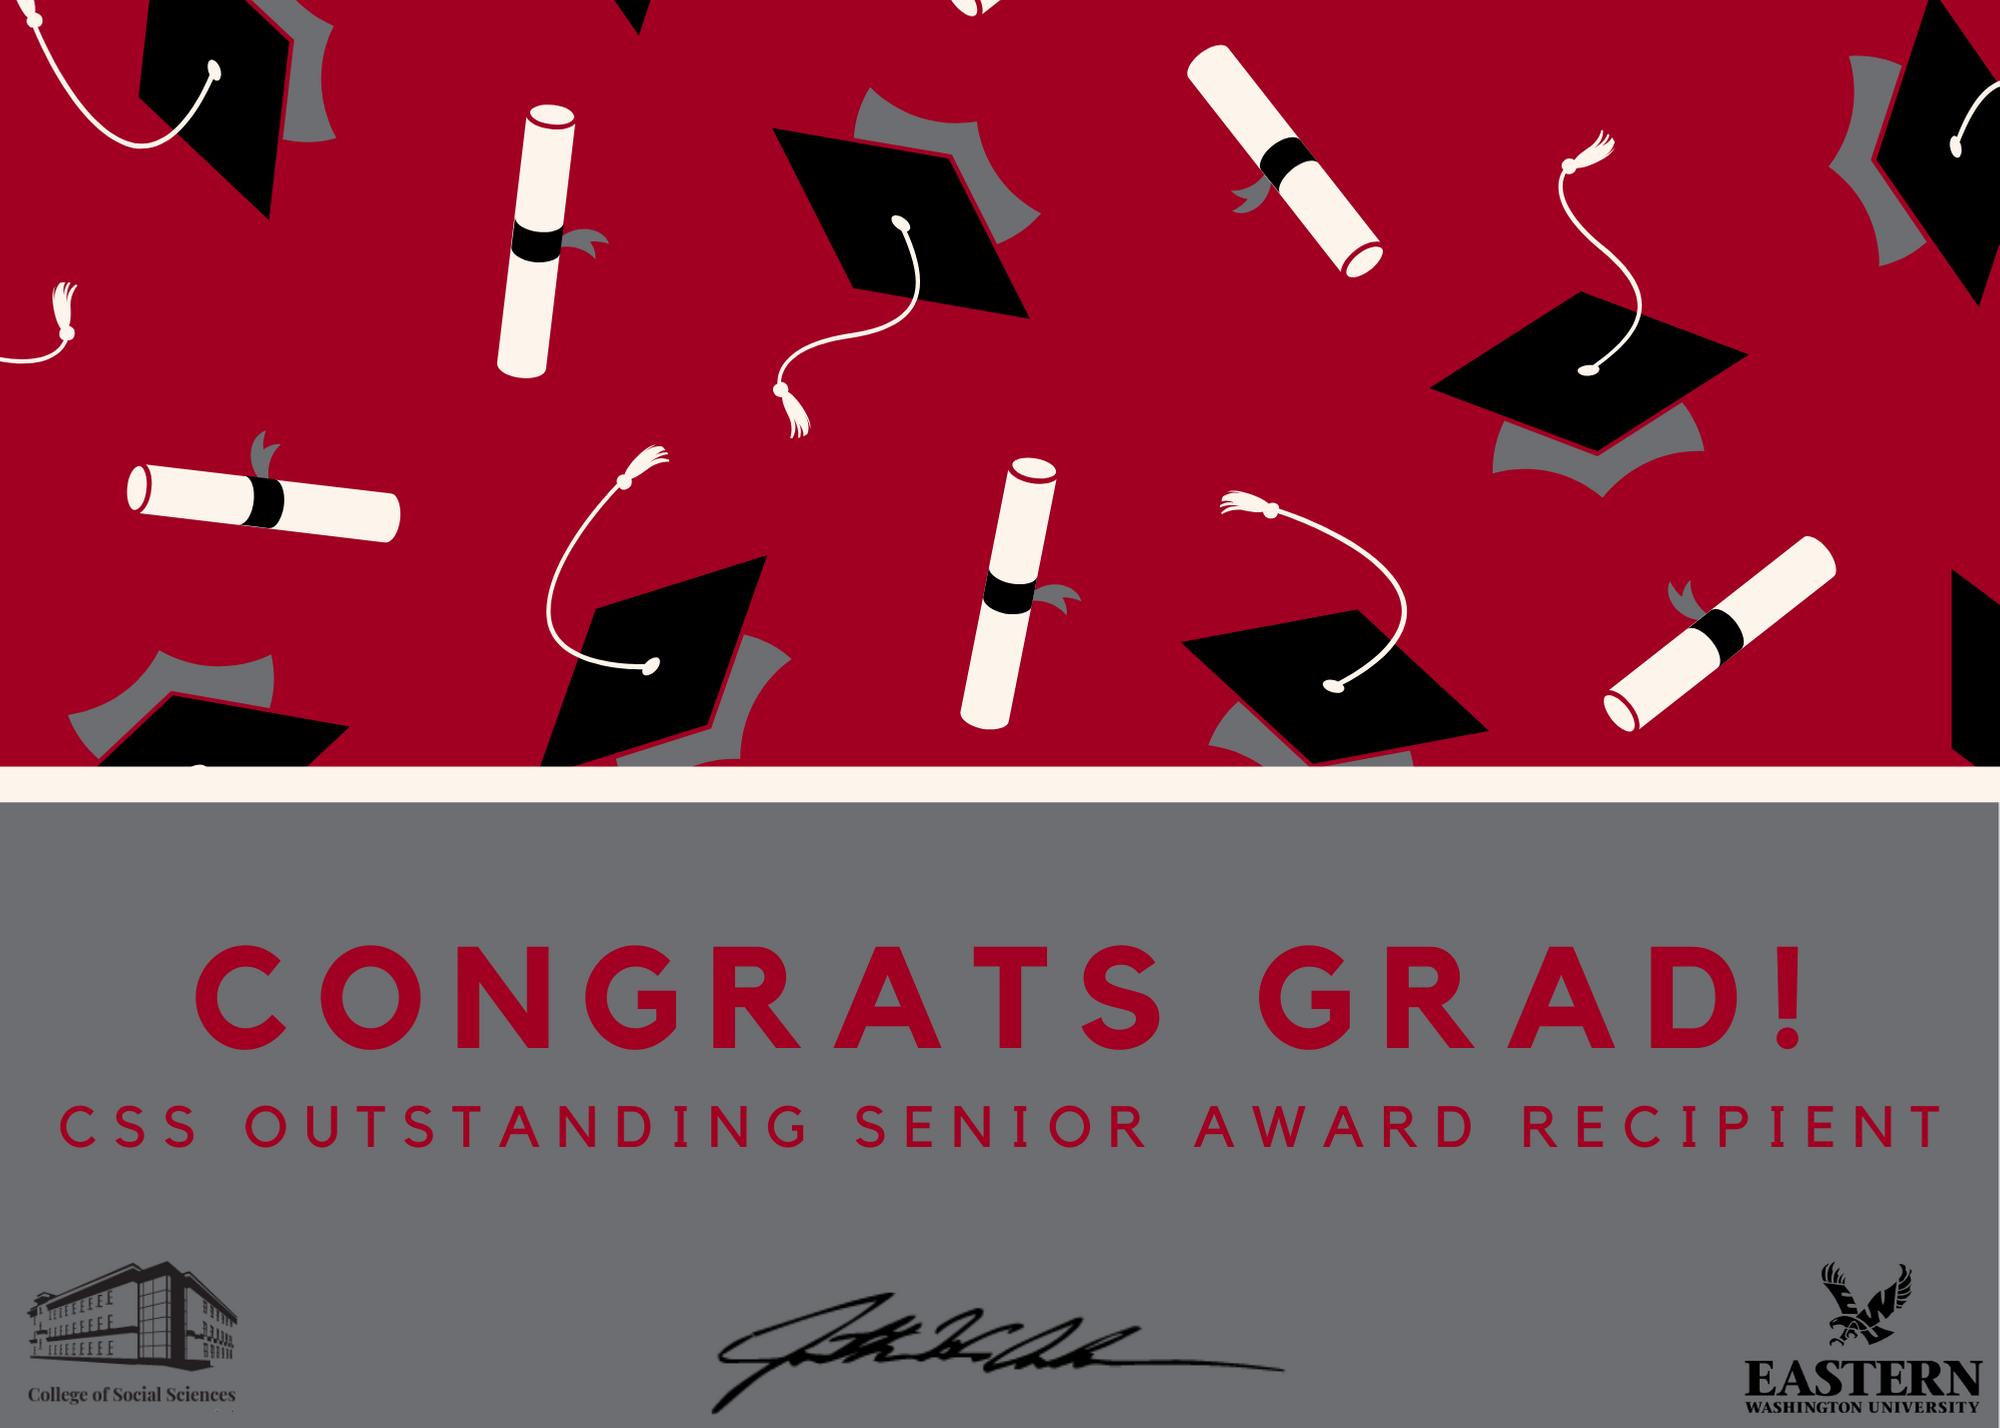 3767-caps-and-diplomas-pattern-graduation-card-2.png